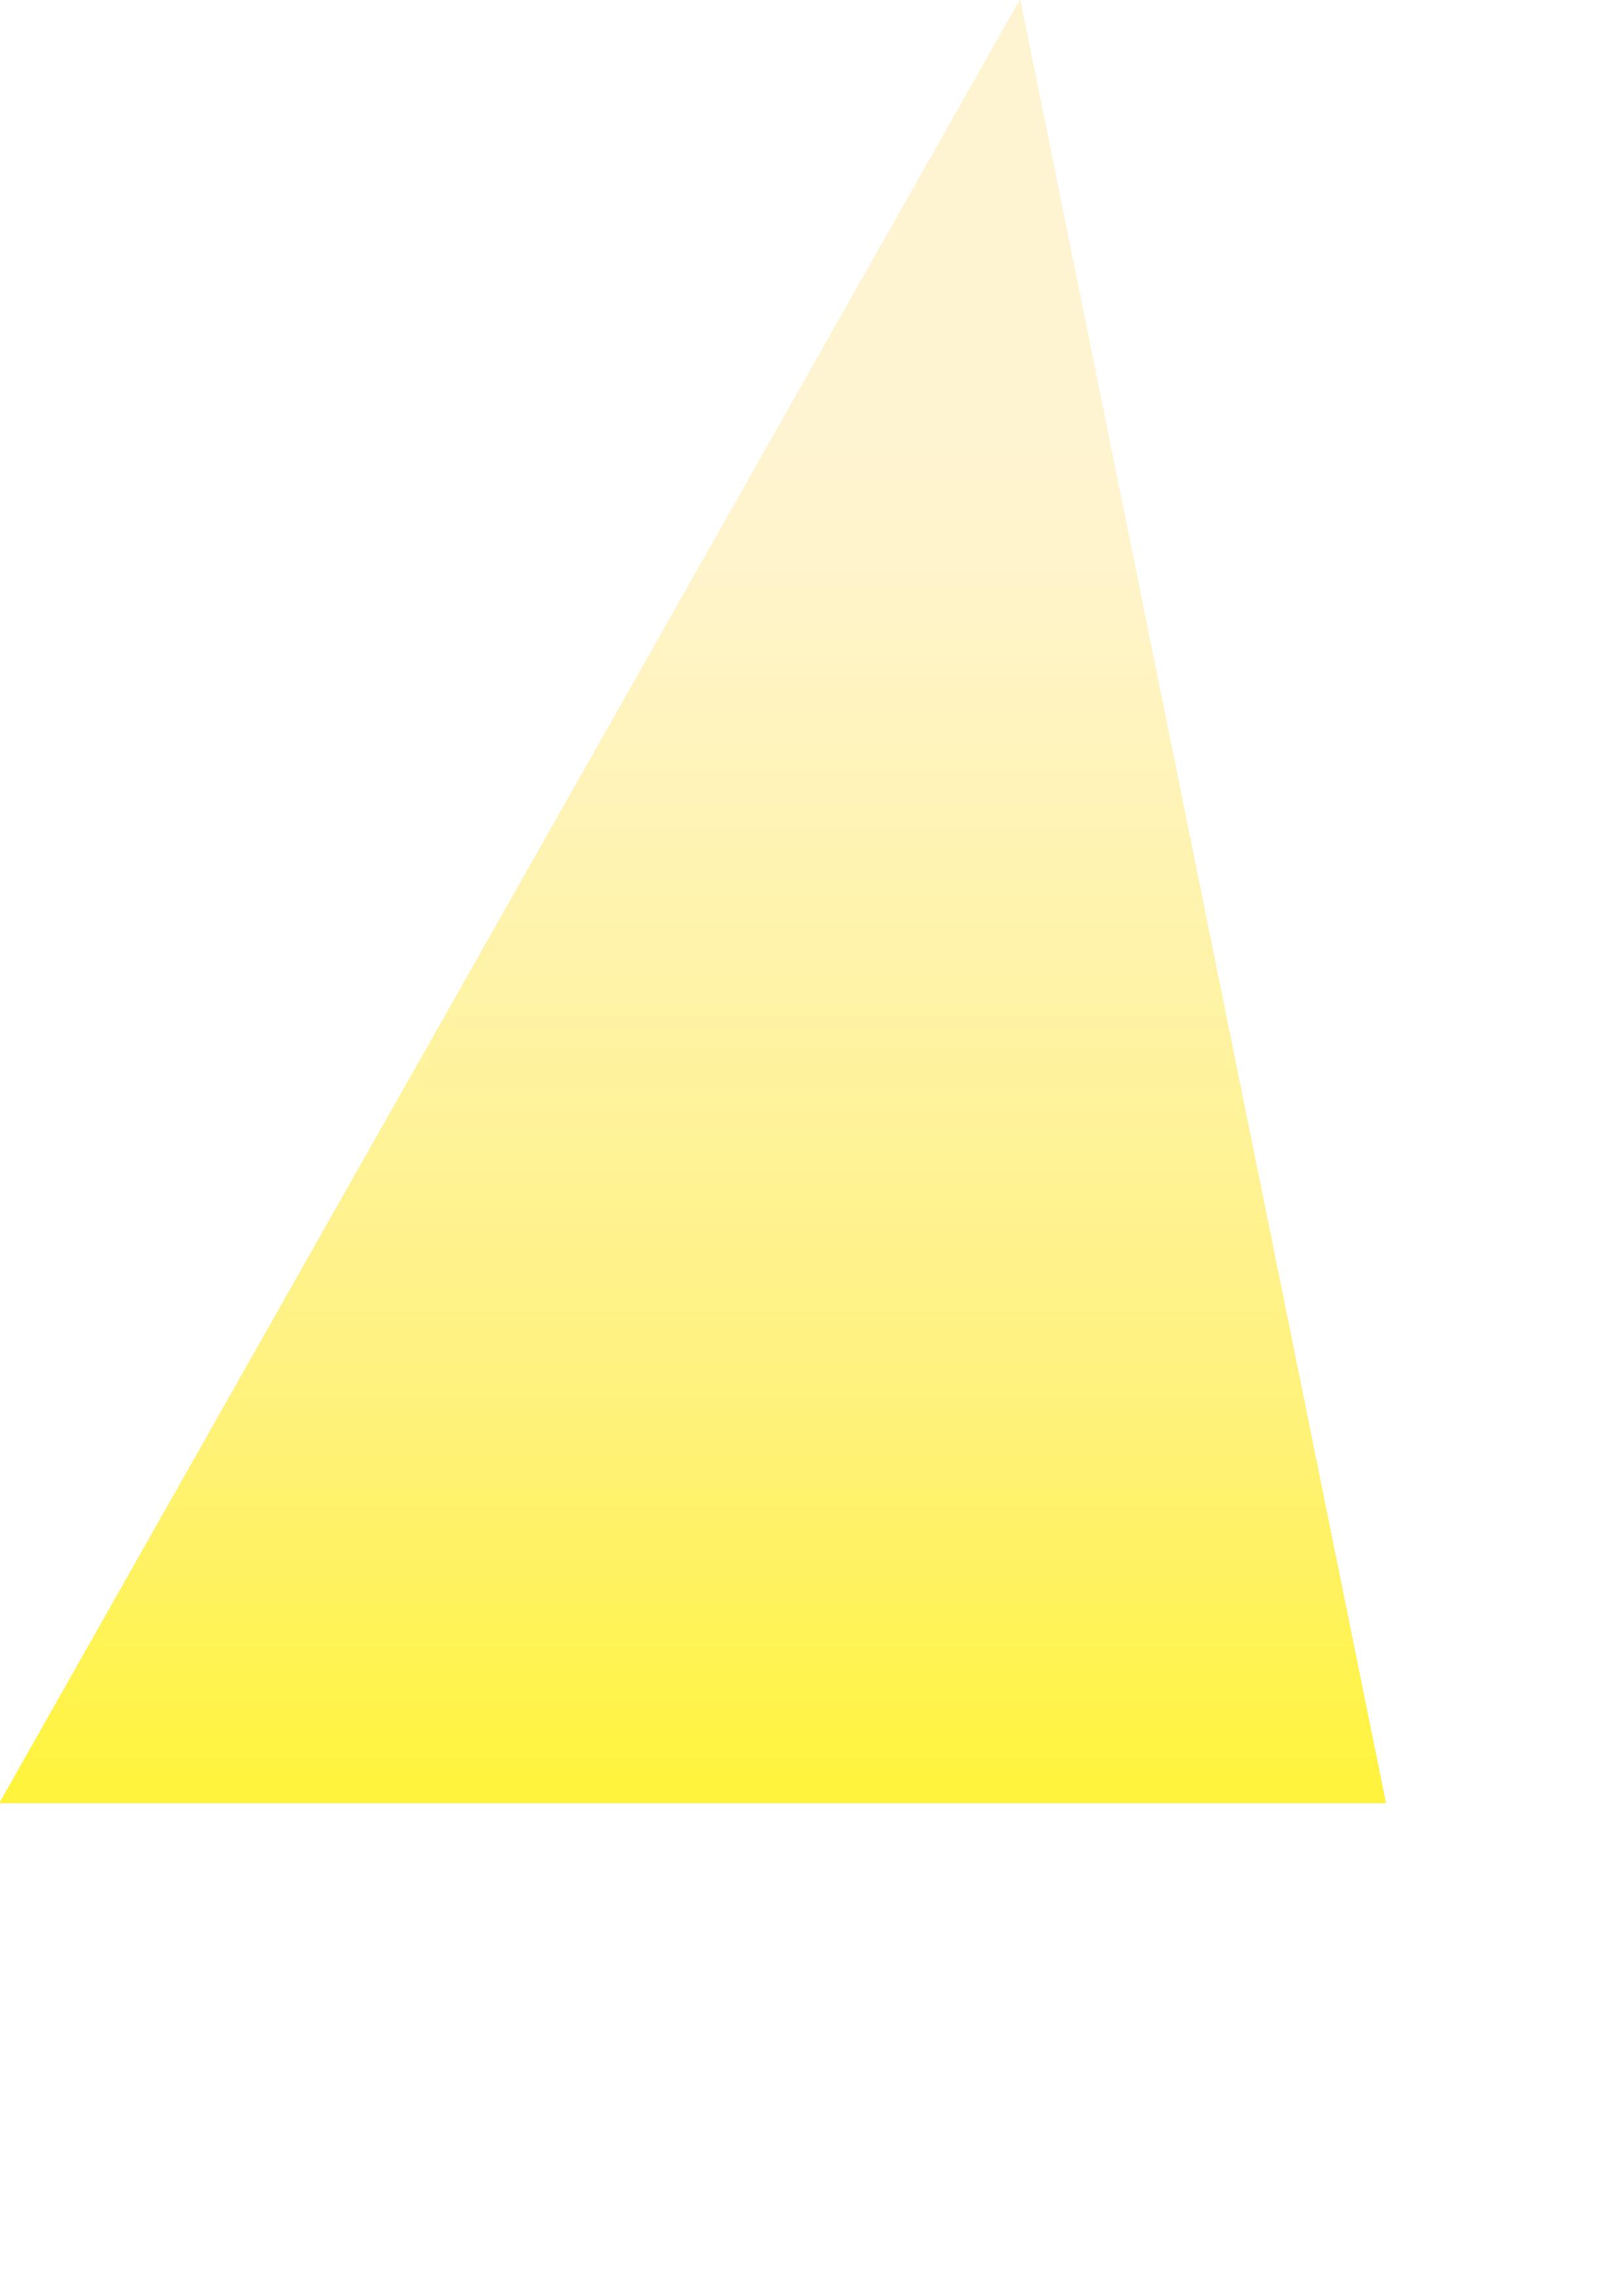 image of yellow spotlight